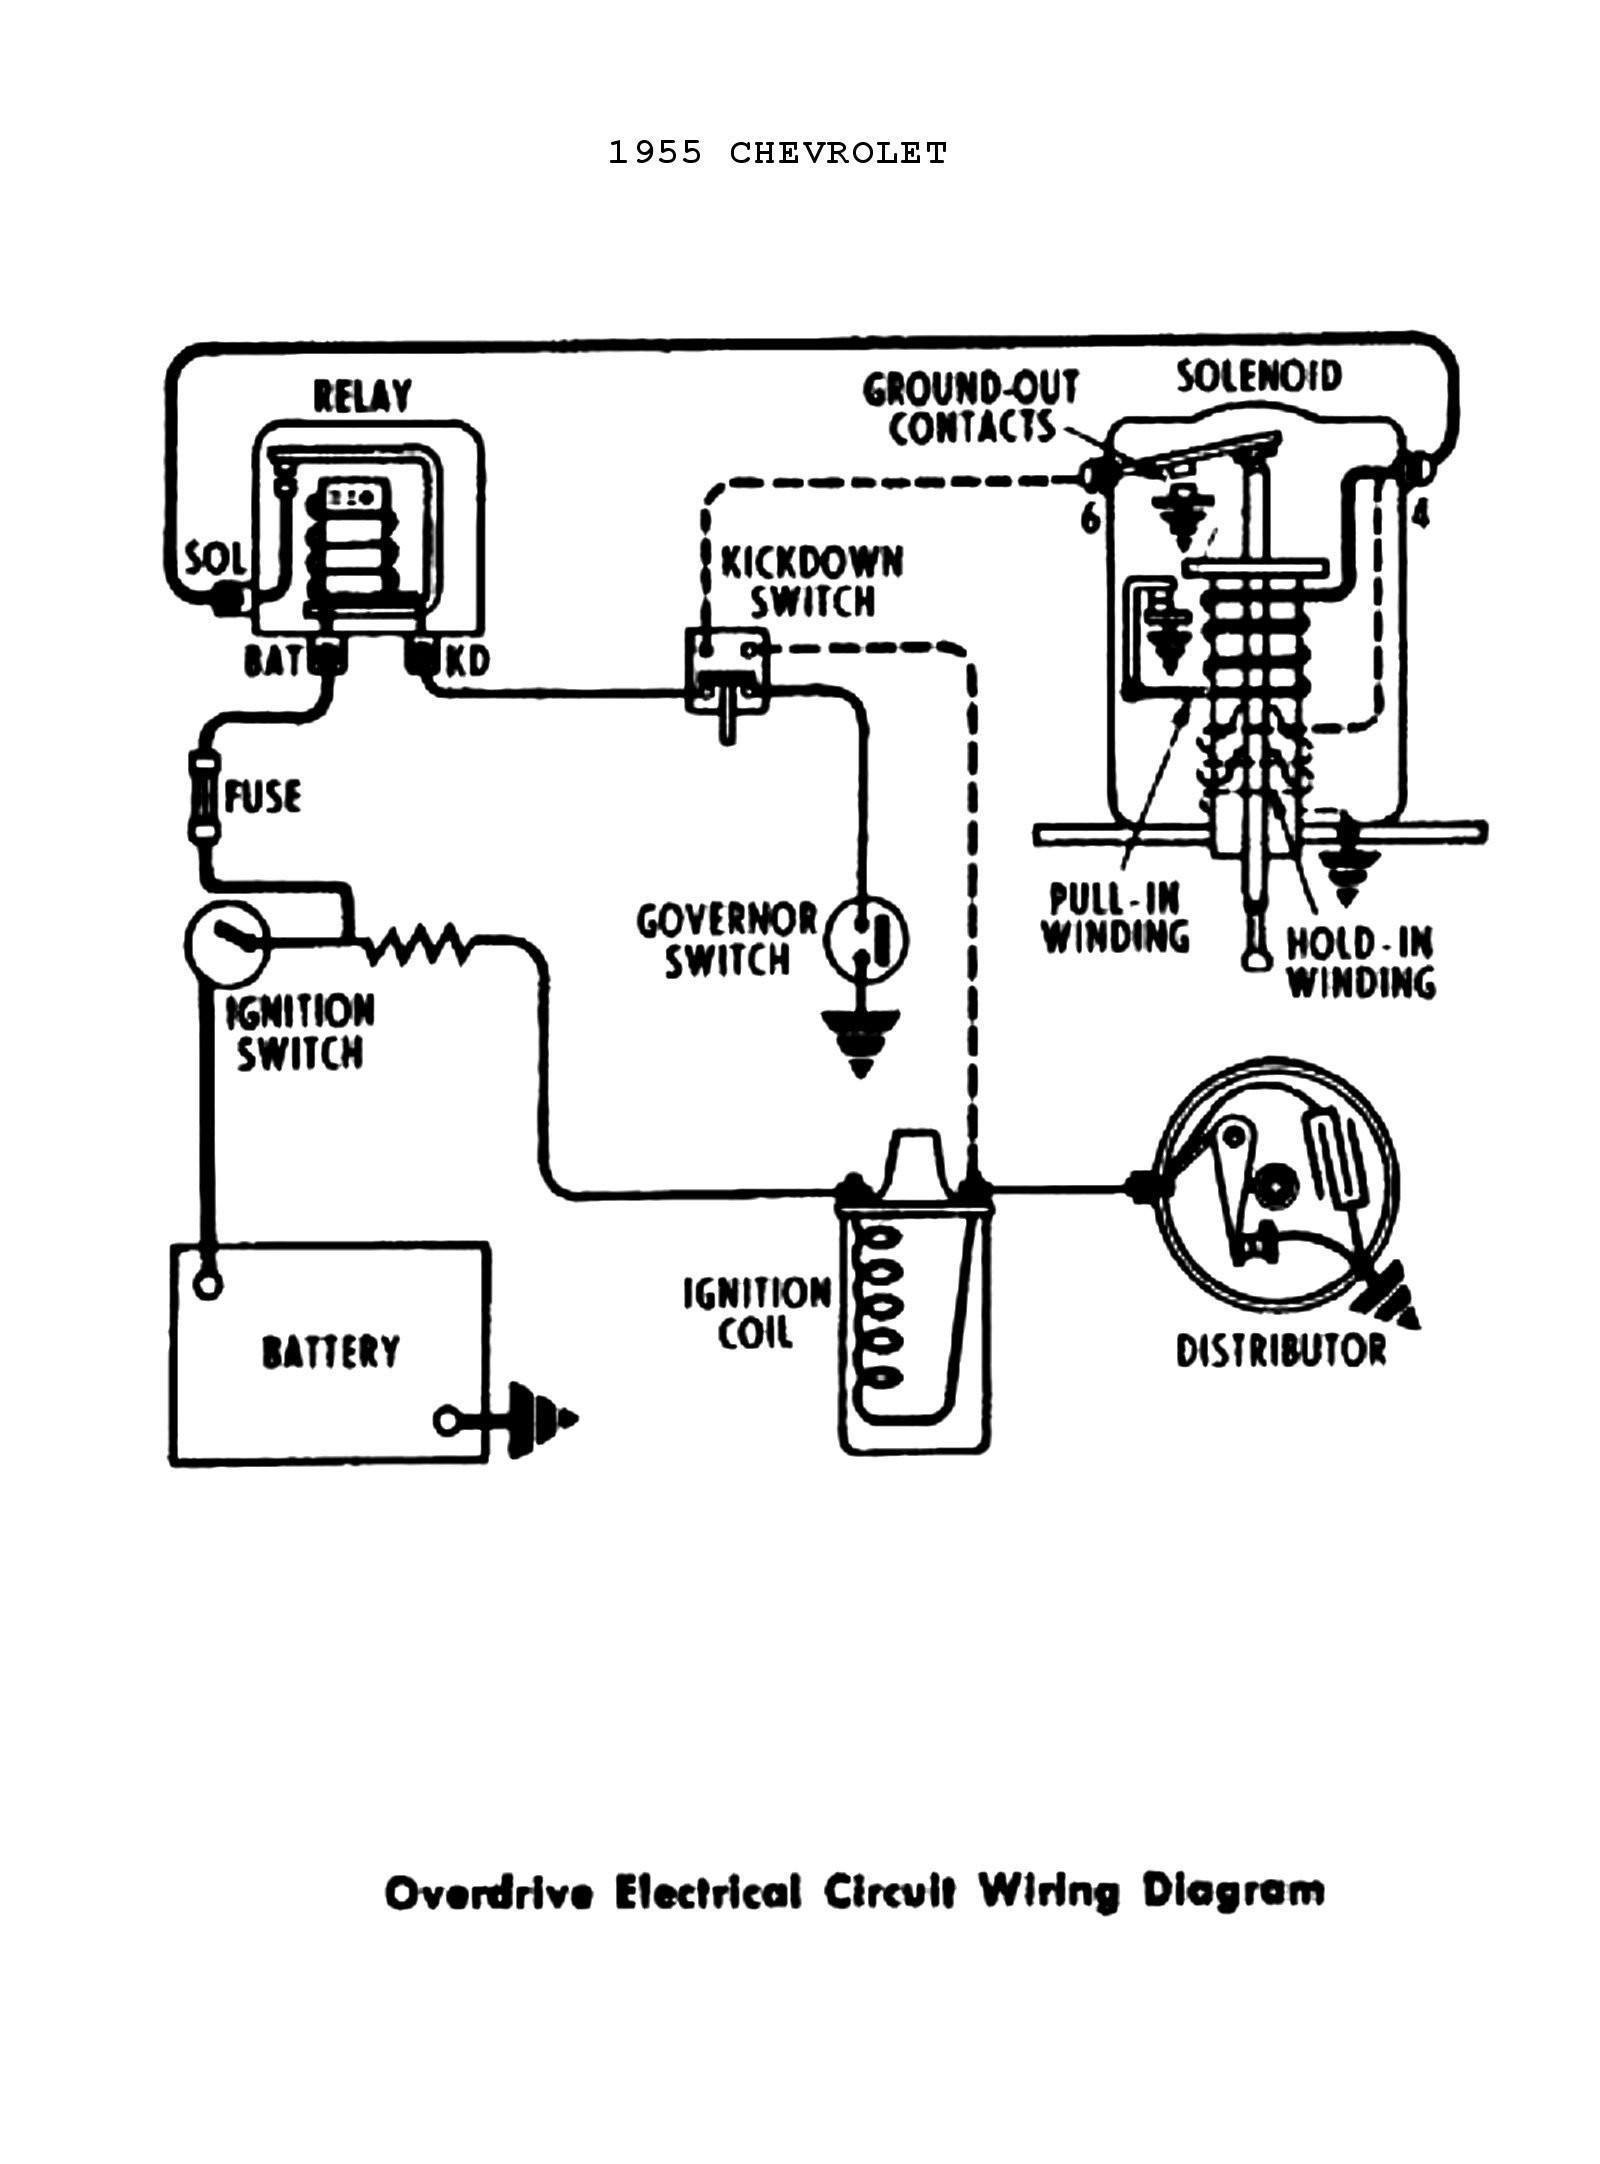 starter solenoid wiring diagram chevy Download-Relay Wiring Diagram for Starter Fresh Wiring Diagram Starter solenoid Best Chevy Ignition Coil Wiring 5-f